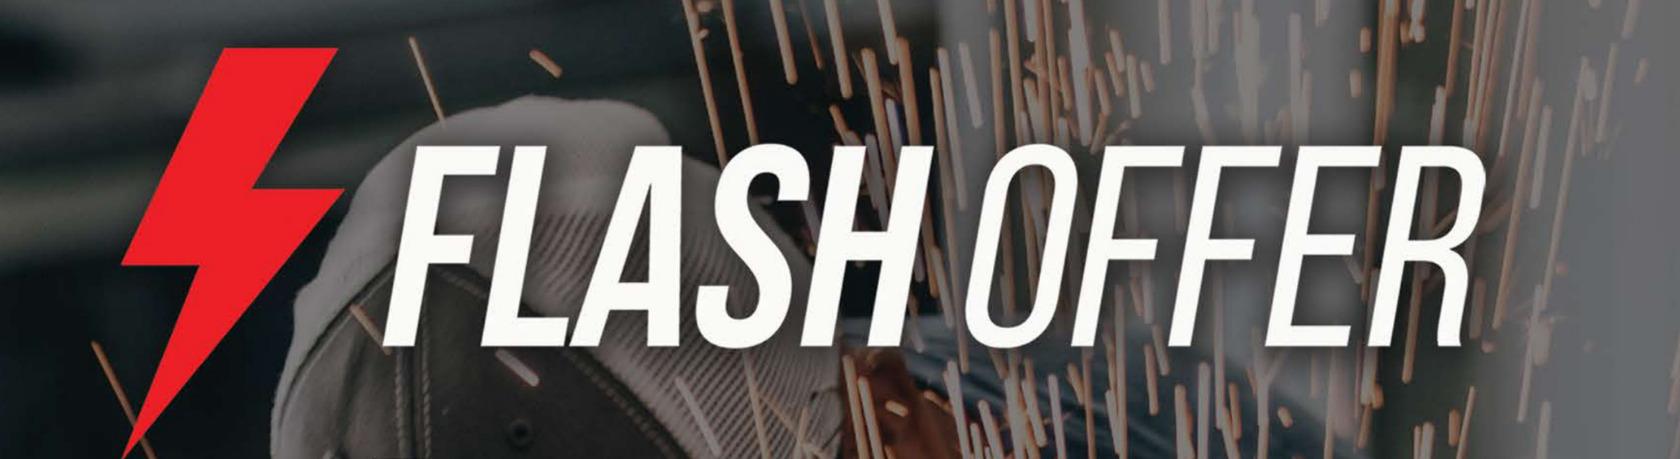 Flash offer 2021 - Ofertas ISOLANA